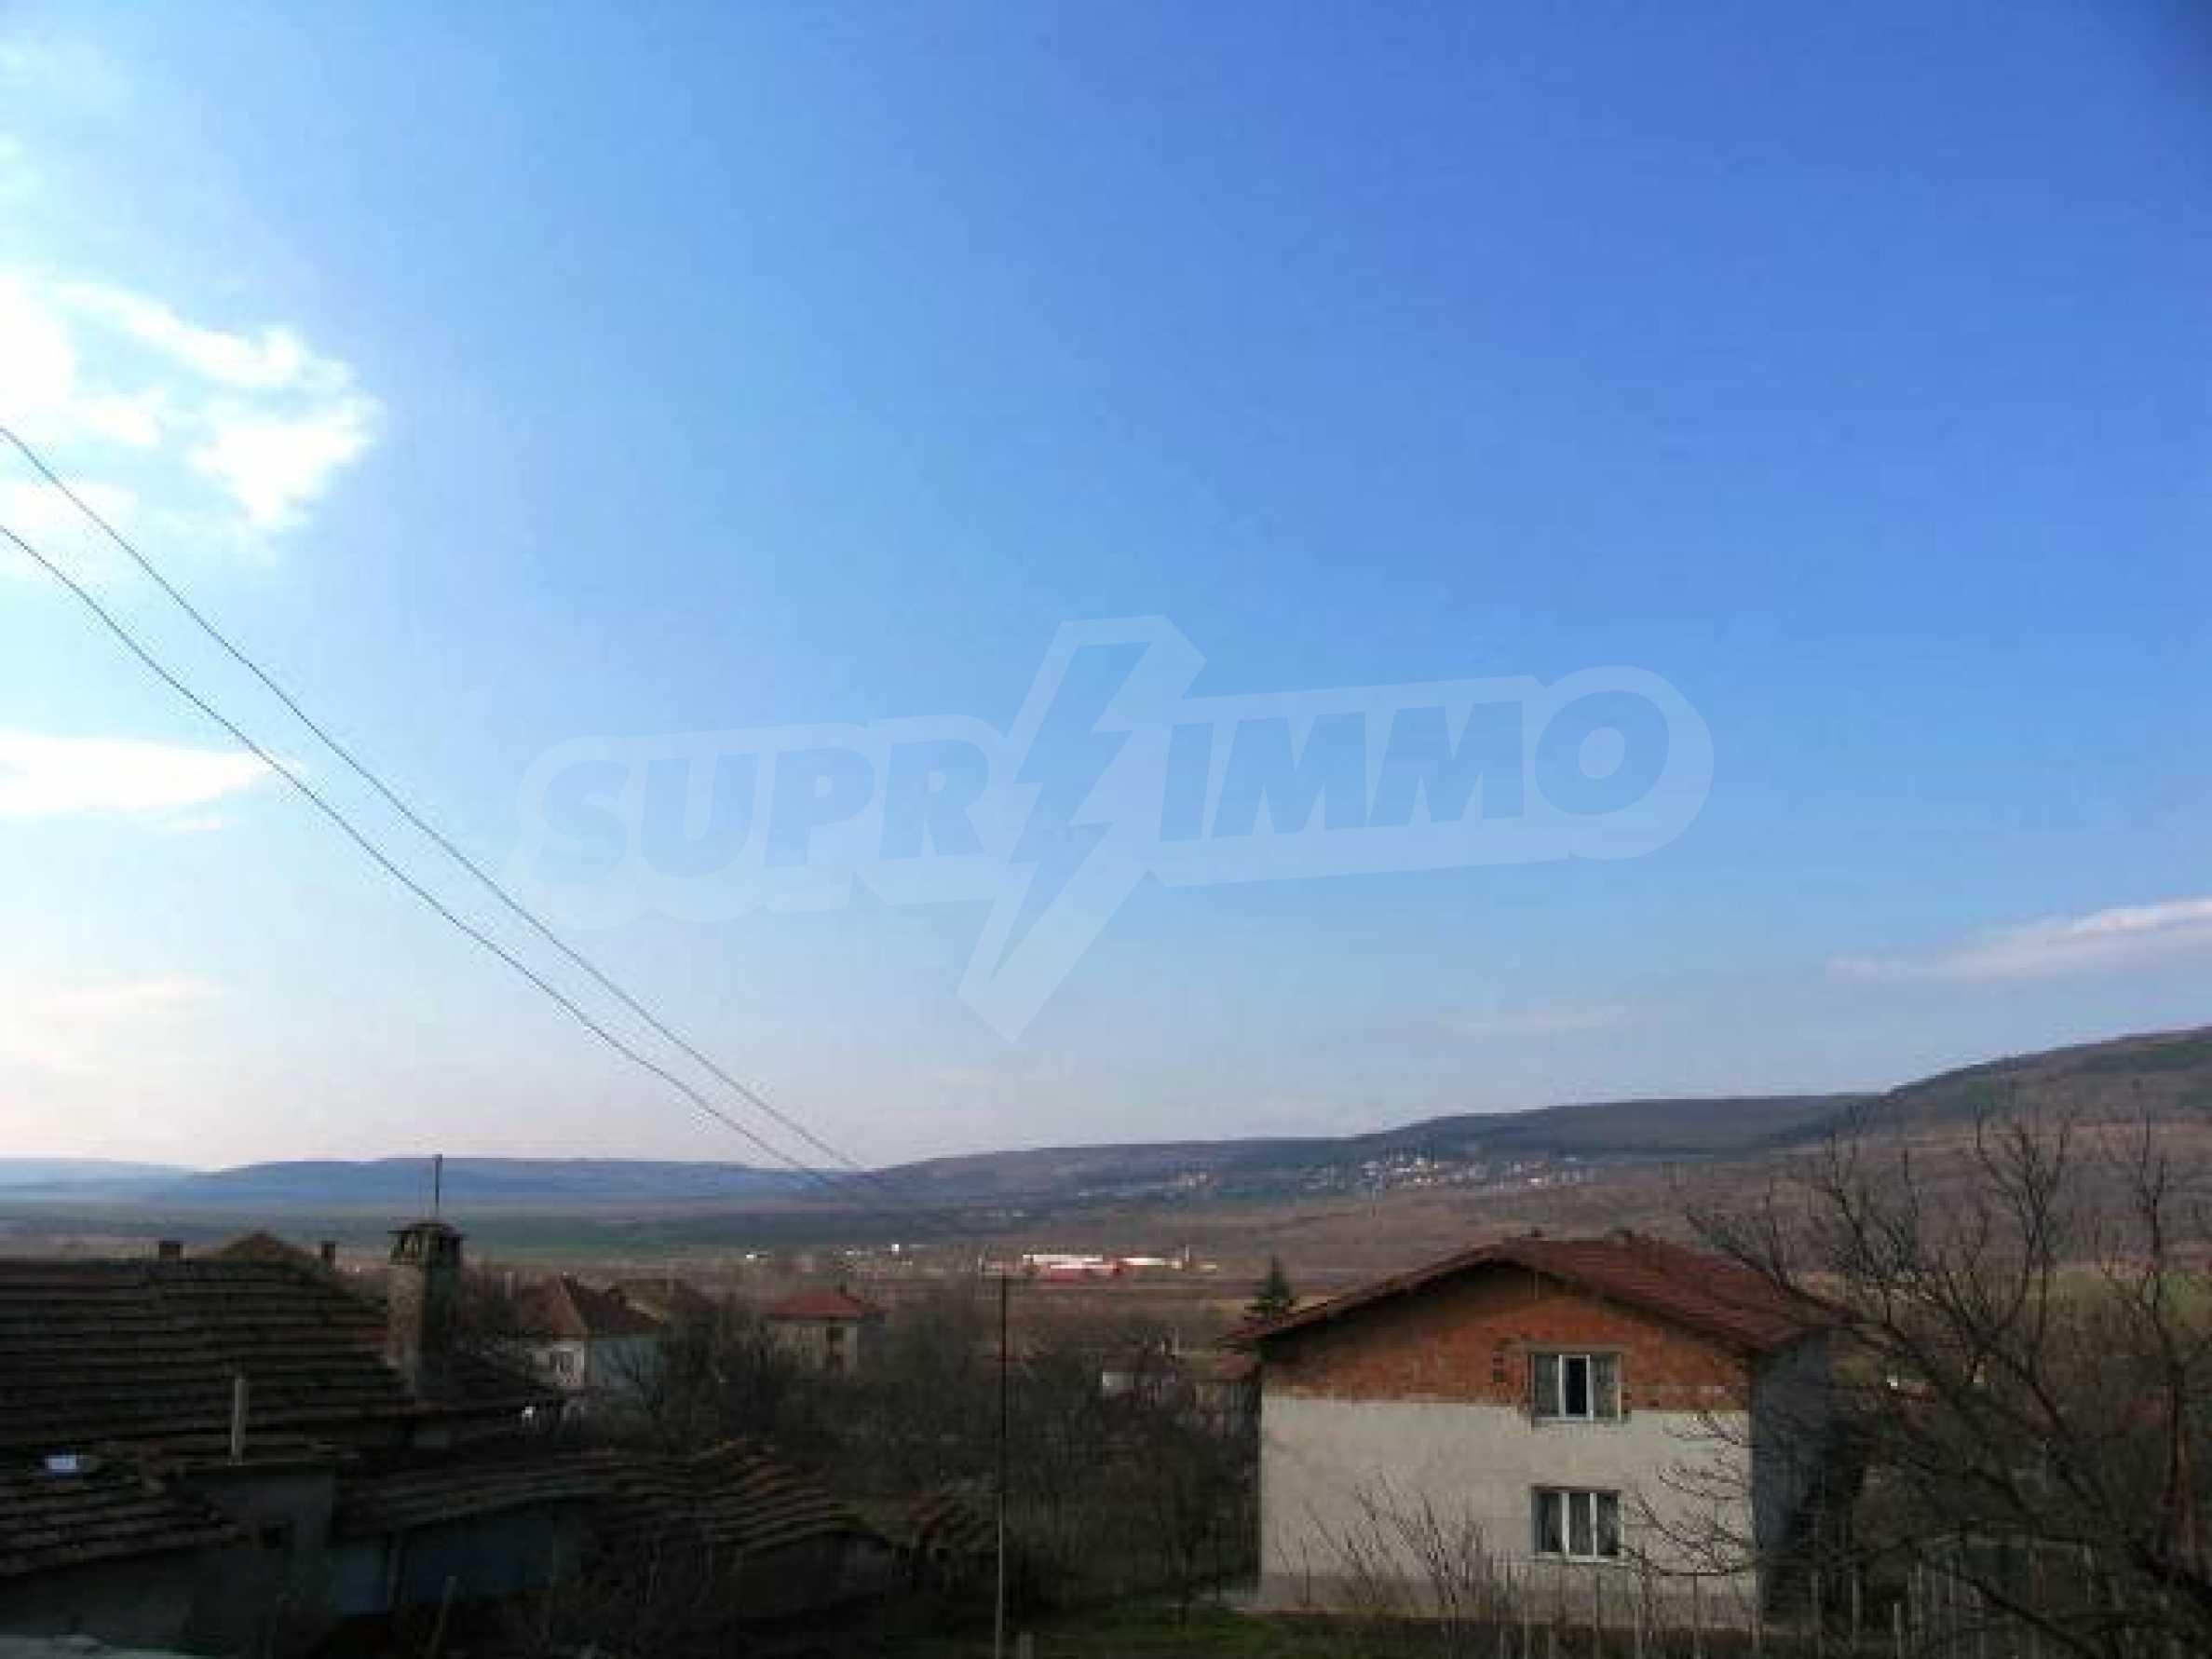 Land in Obrochishte Village, just 3km from Albena Resort  4